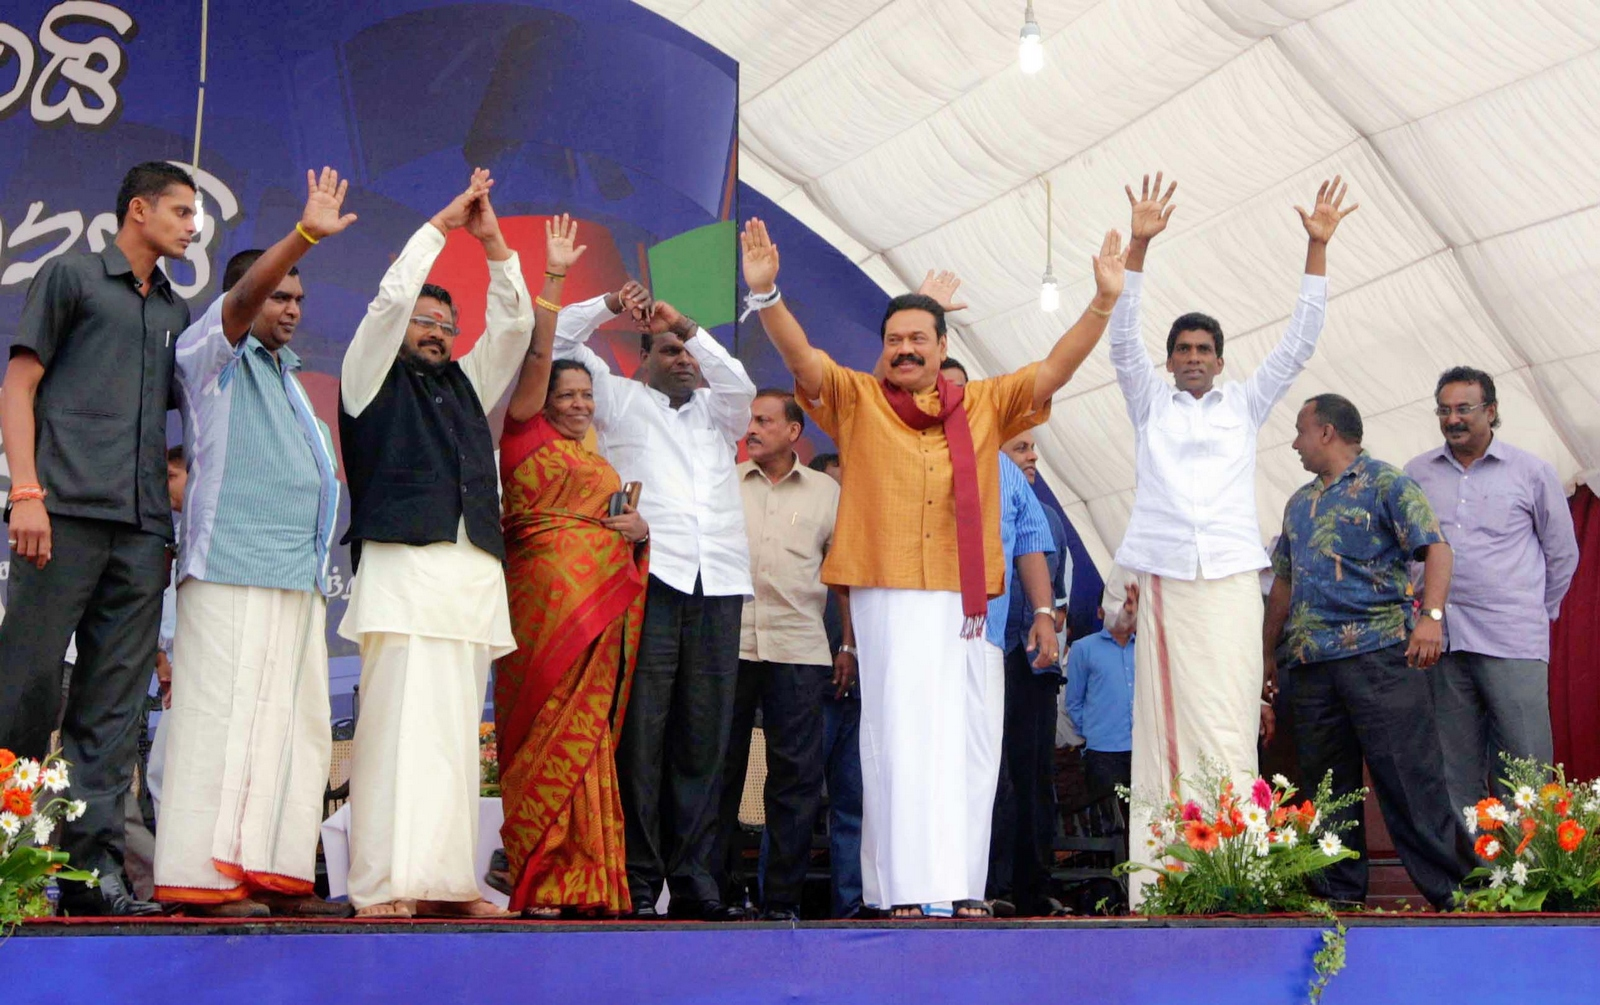 Incumbent Sri Lankan President Mahinda Rajapaksa waves to the crowd at a political rally. Via President Rajapaksa's flickr account.